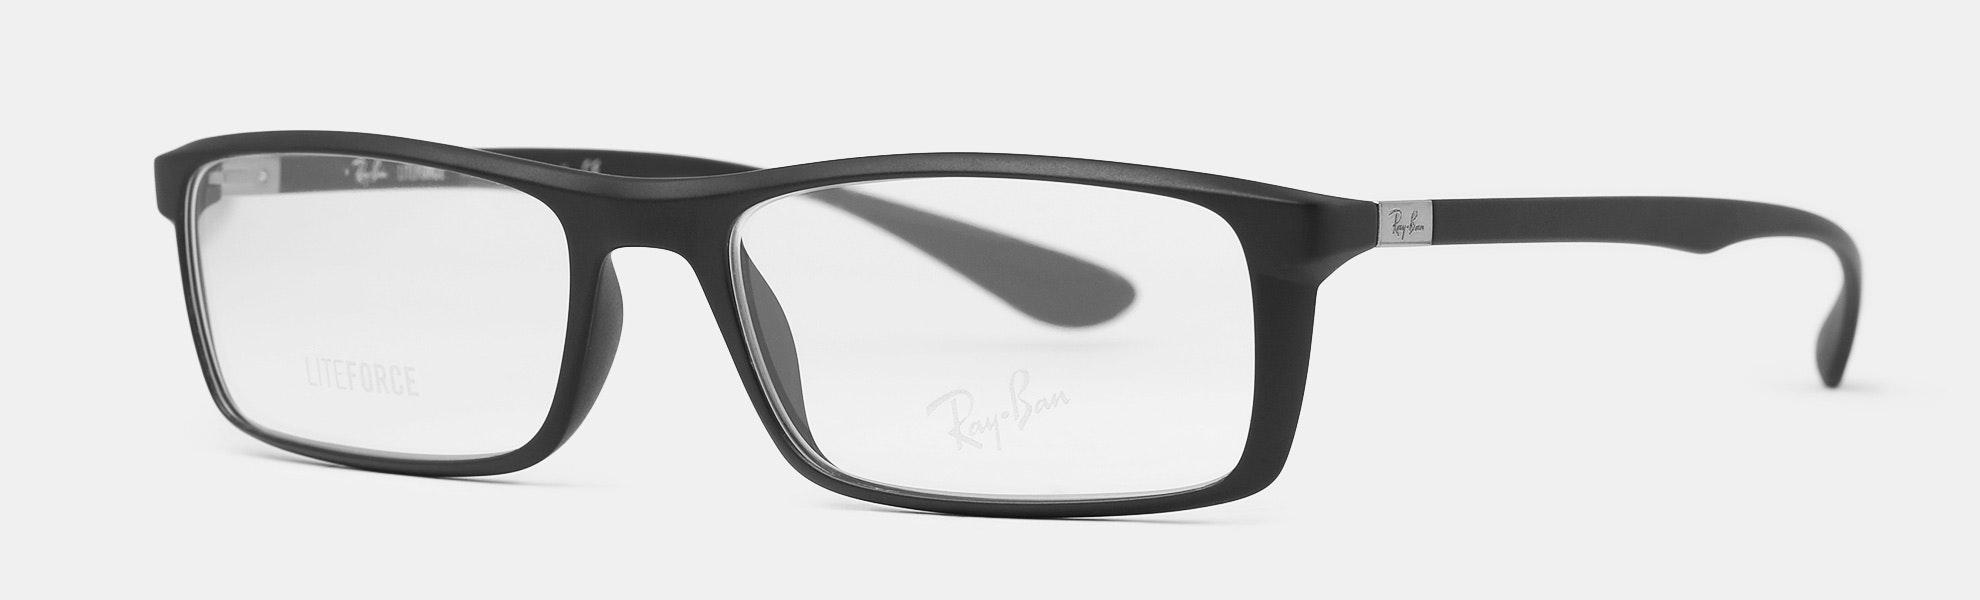 Ray-Ban Liteforce RX7035 Eyeglasses